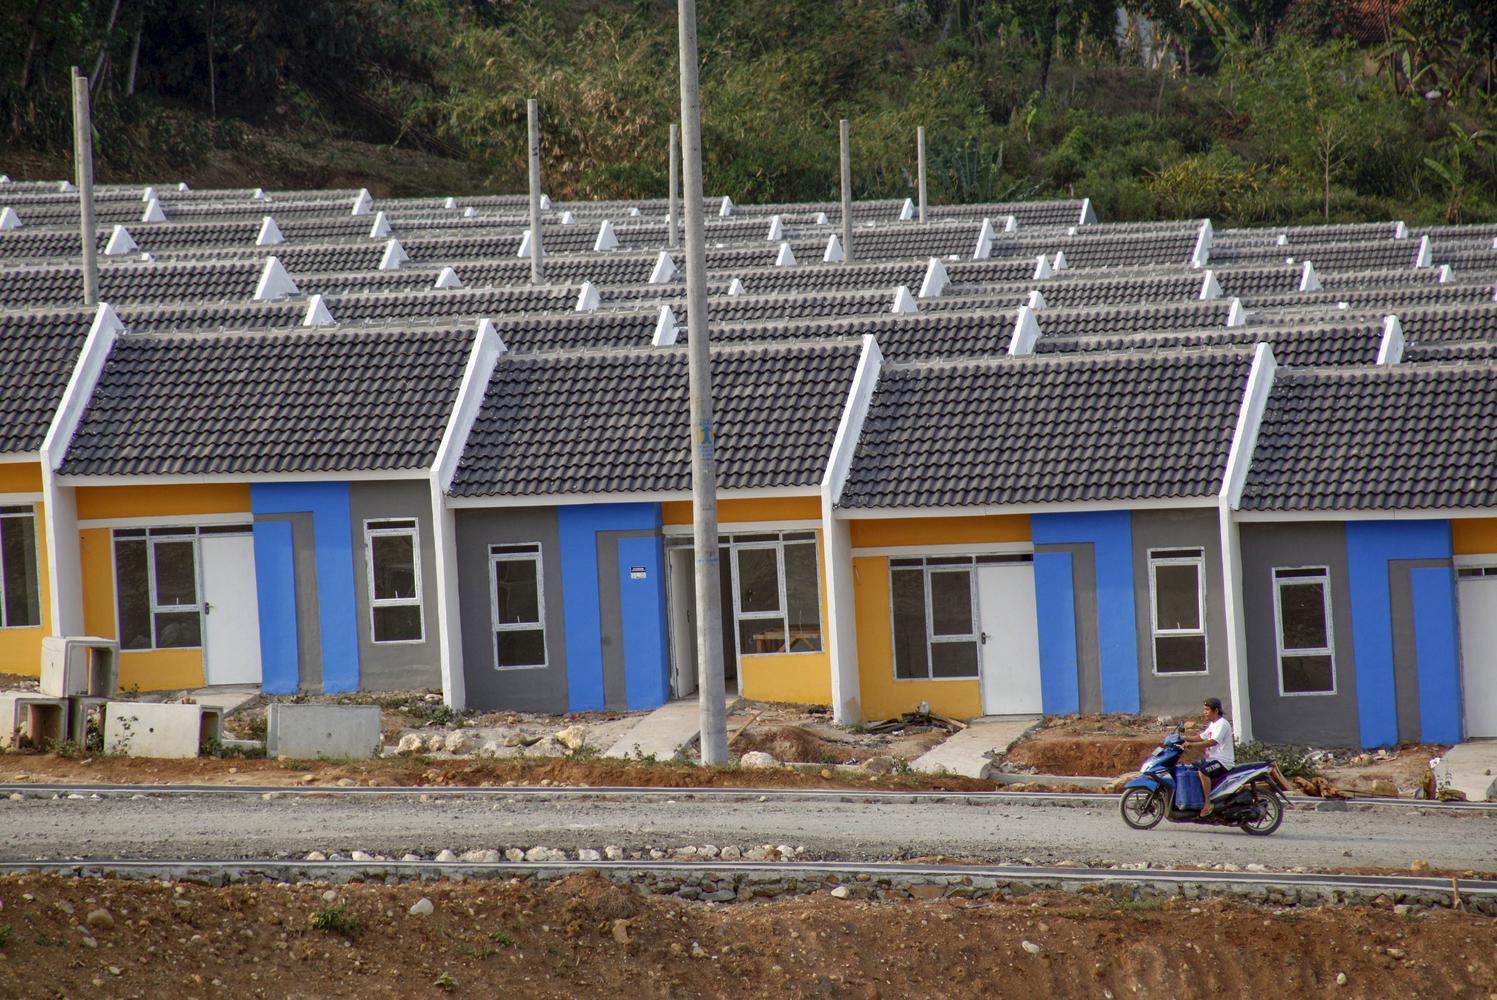 Warga berkendara di kawasan perumahan bersubsidi di kawasan Citeureup, Bogor, Jawa Barat, Senin (7/10/2019). Pemerintah memutuskan menambah anggaran untuk penyaluran rumah subsidi bagi Masyarakat Berpenghasilan Rendah (MBR) melalui skema Fasilitas Likuidi